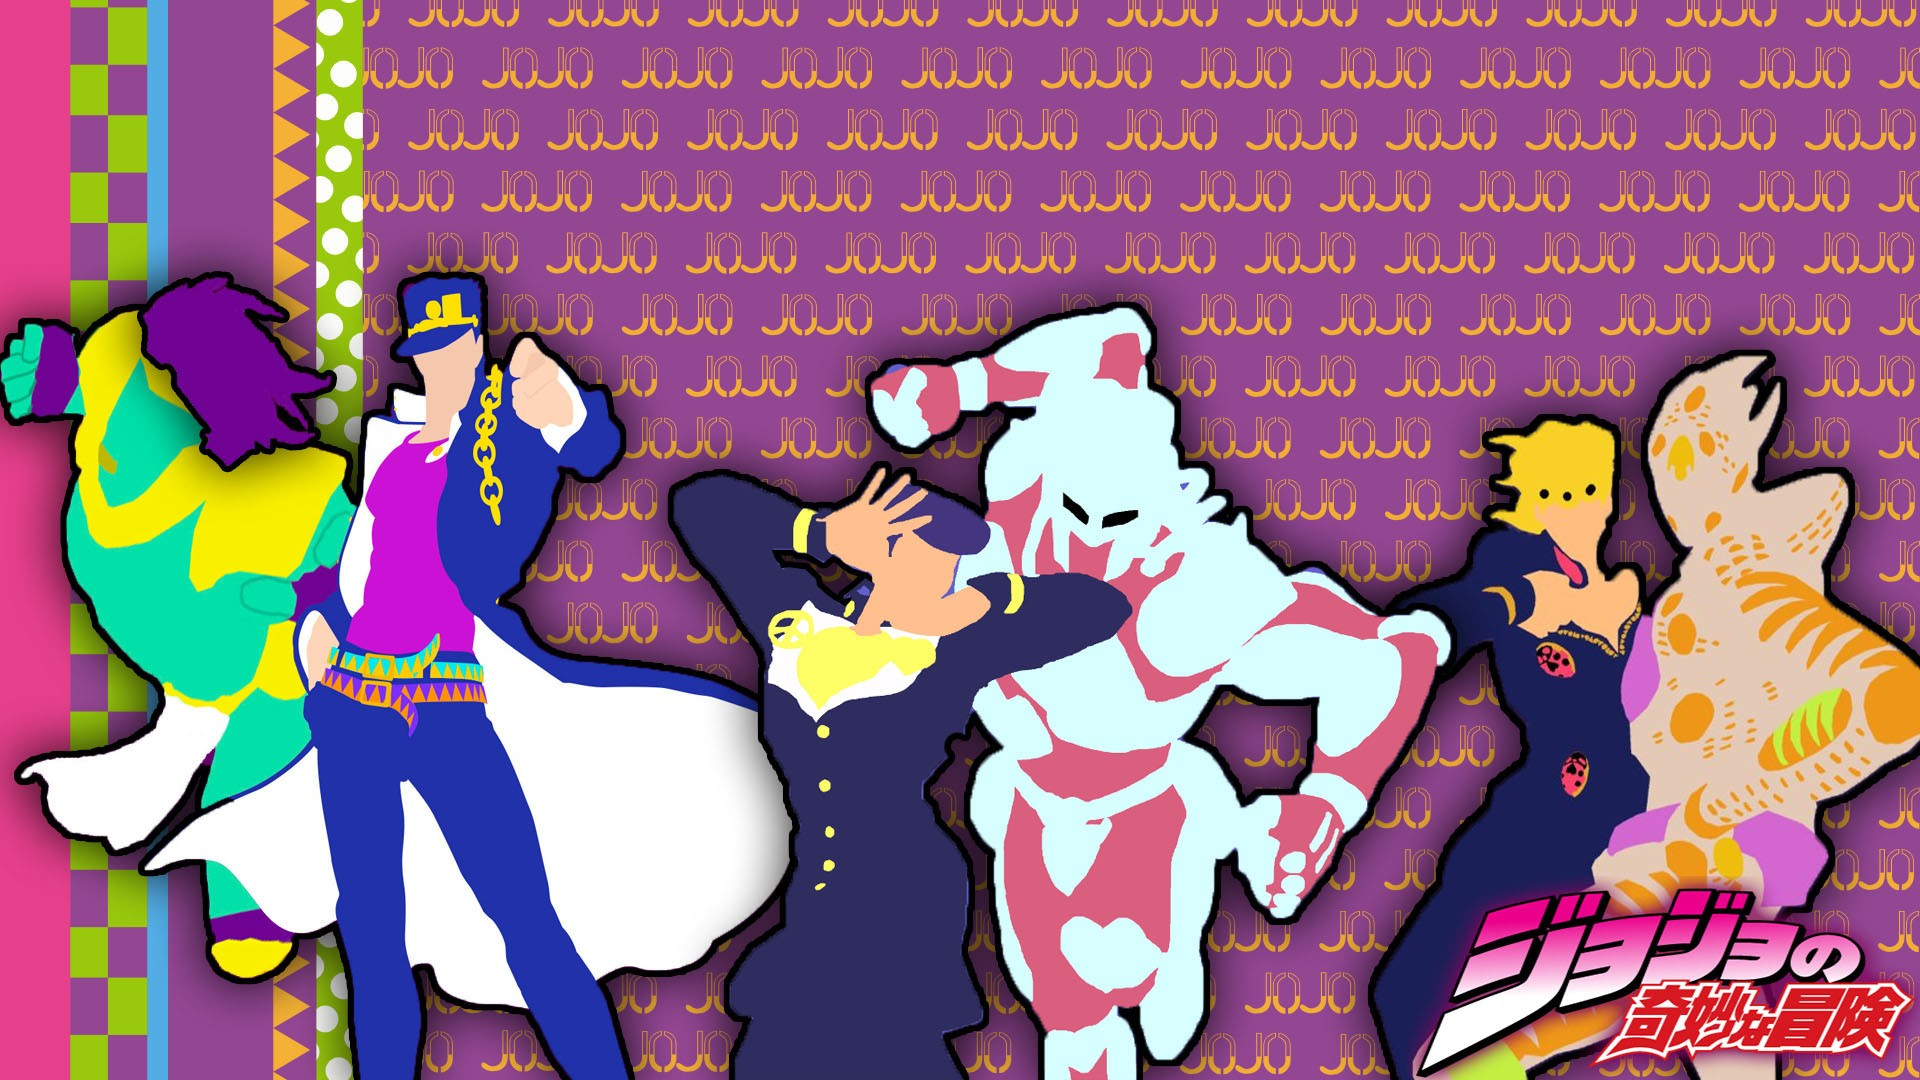 Jojo Bizarre Adventure wallpaper ·① Download free awesome ...